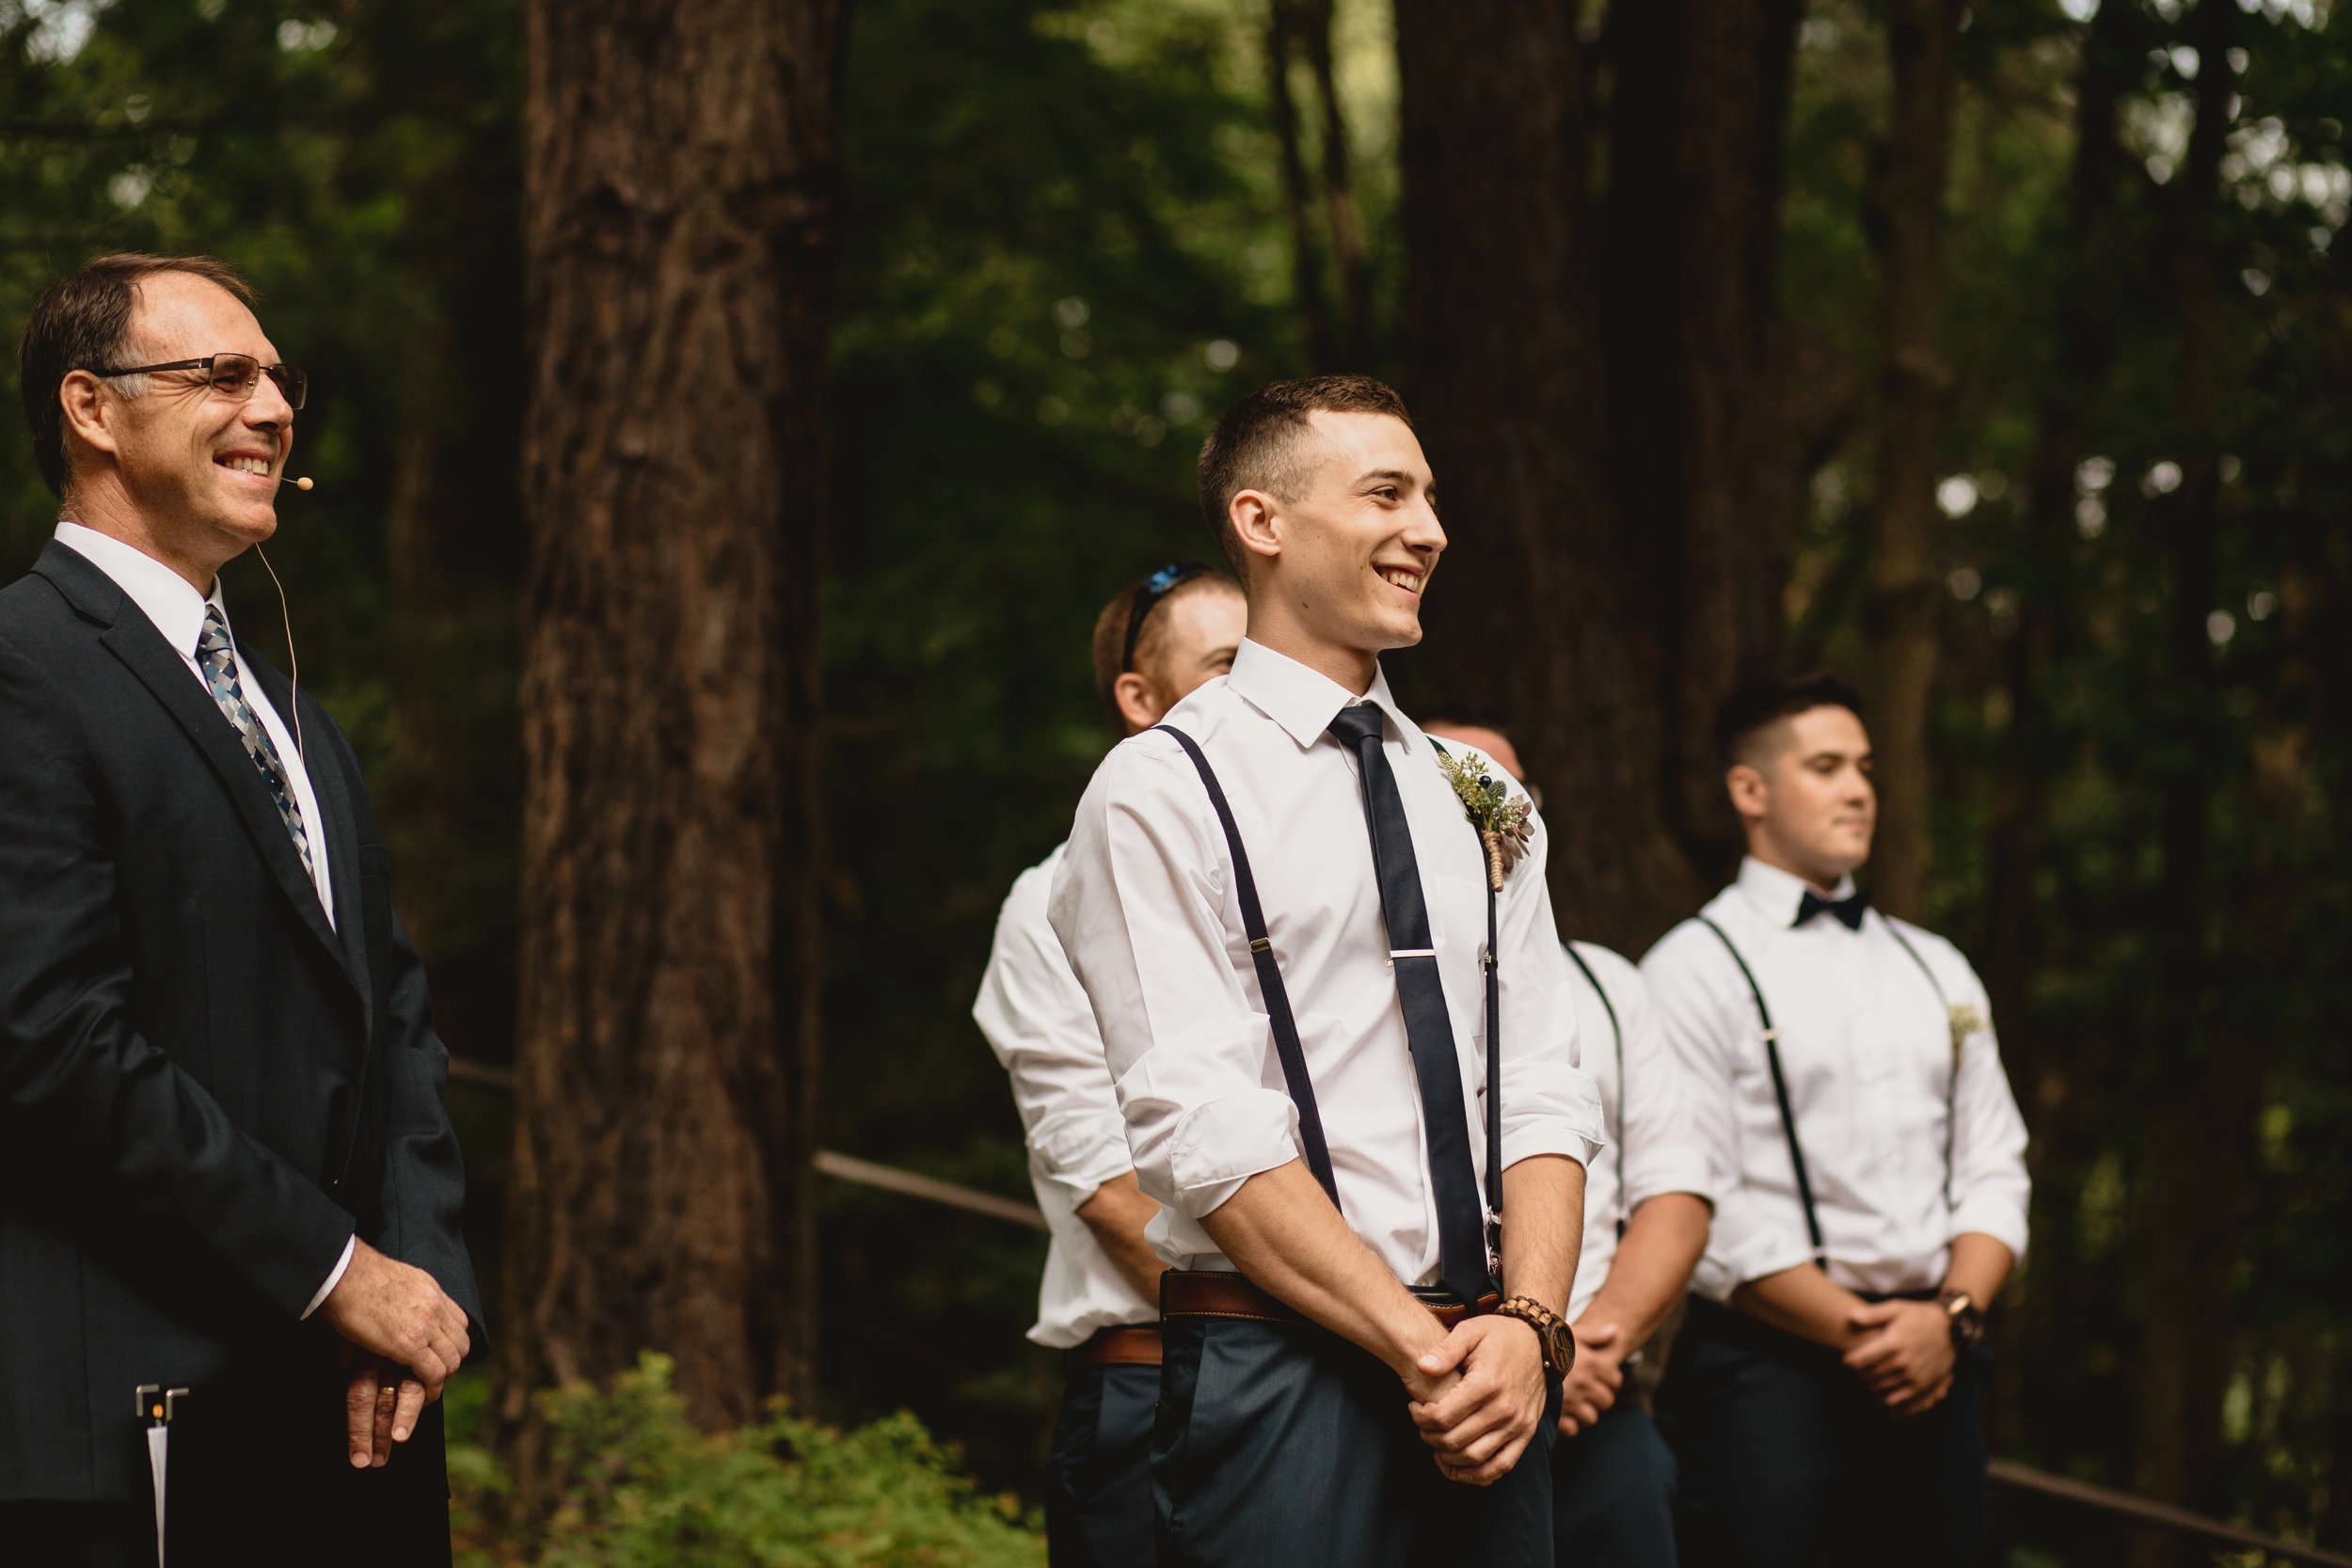 west-michigan-wedding-photographer-whitehall-rachel-austin-chapel-in-the-pines-245.jpg